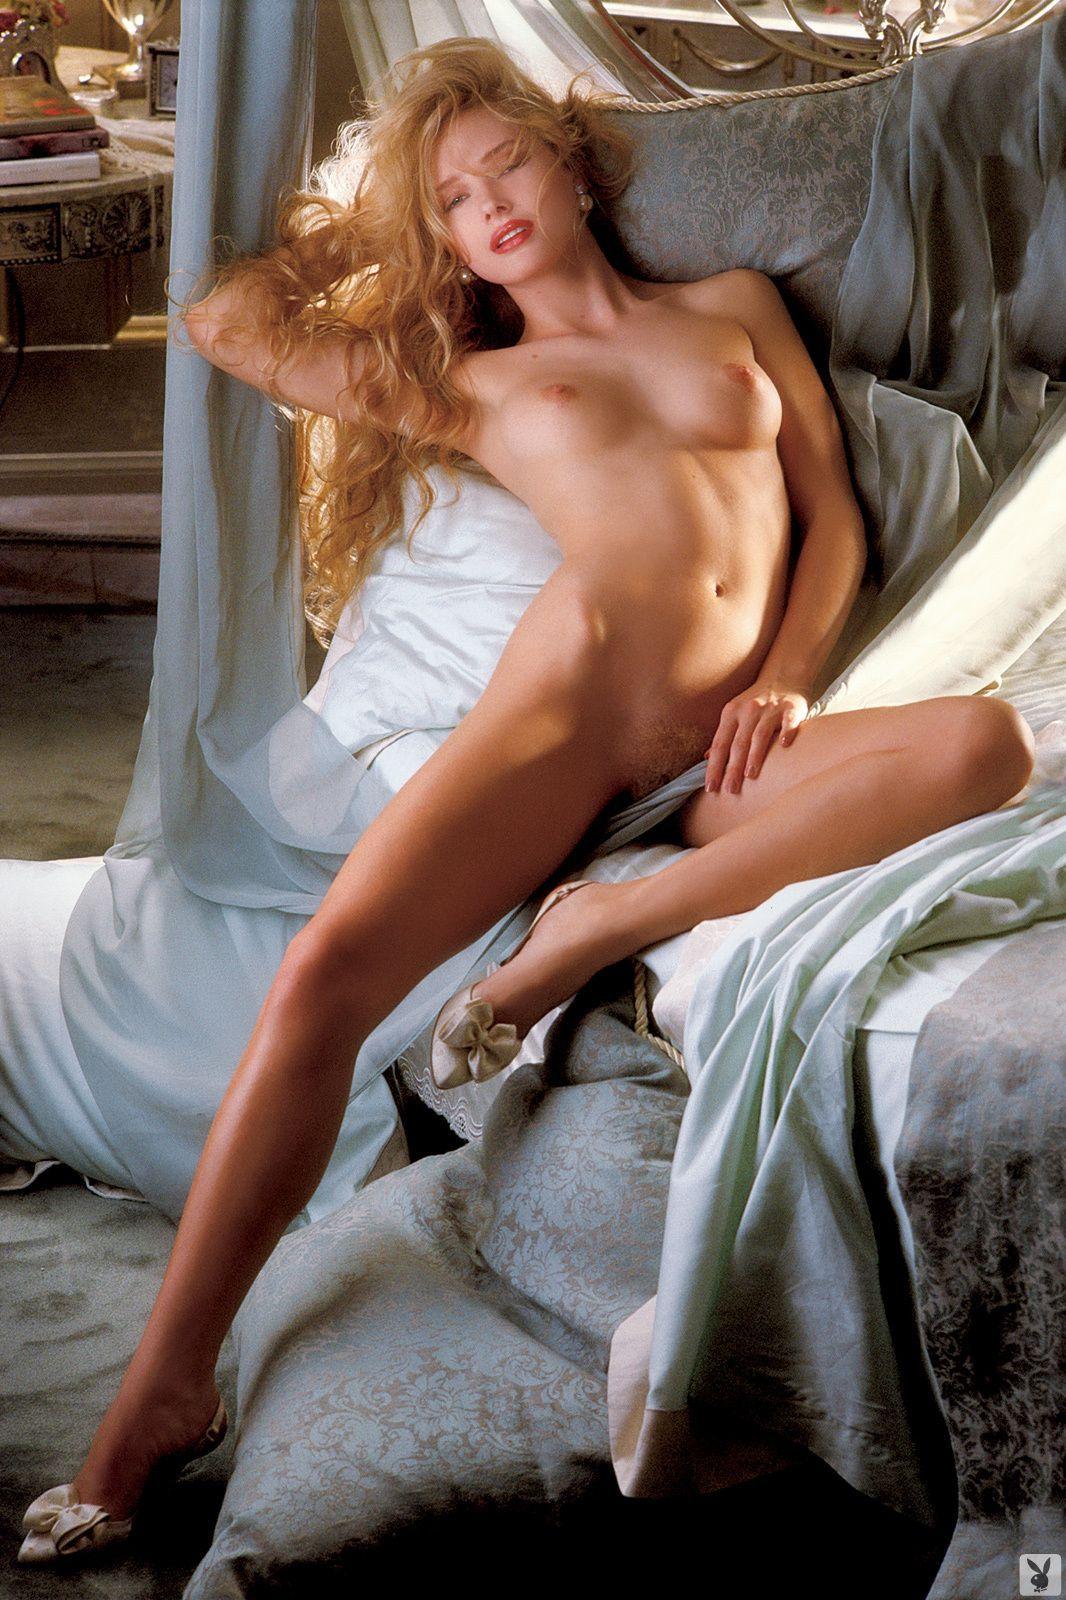 Paula perrette nude photos